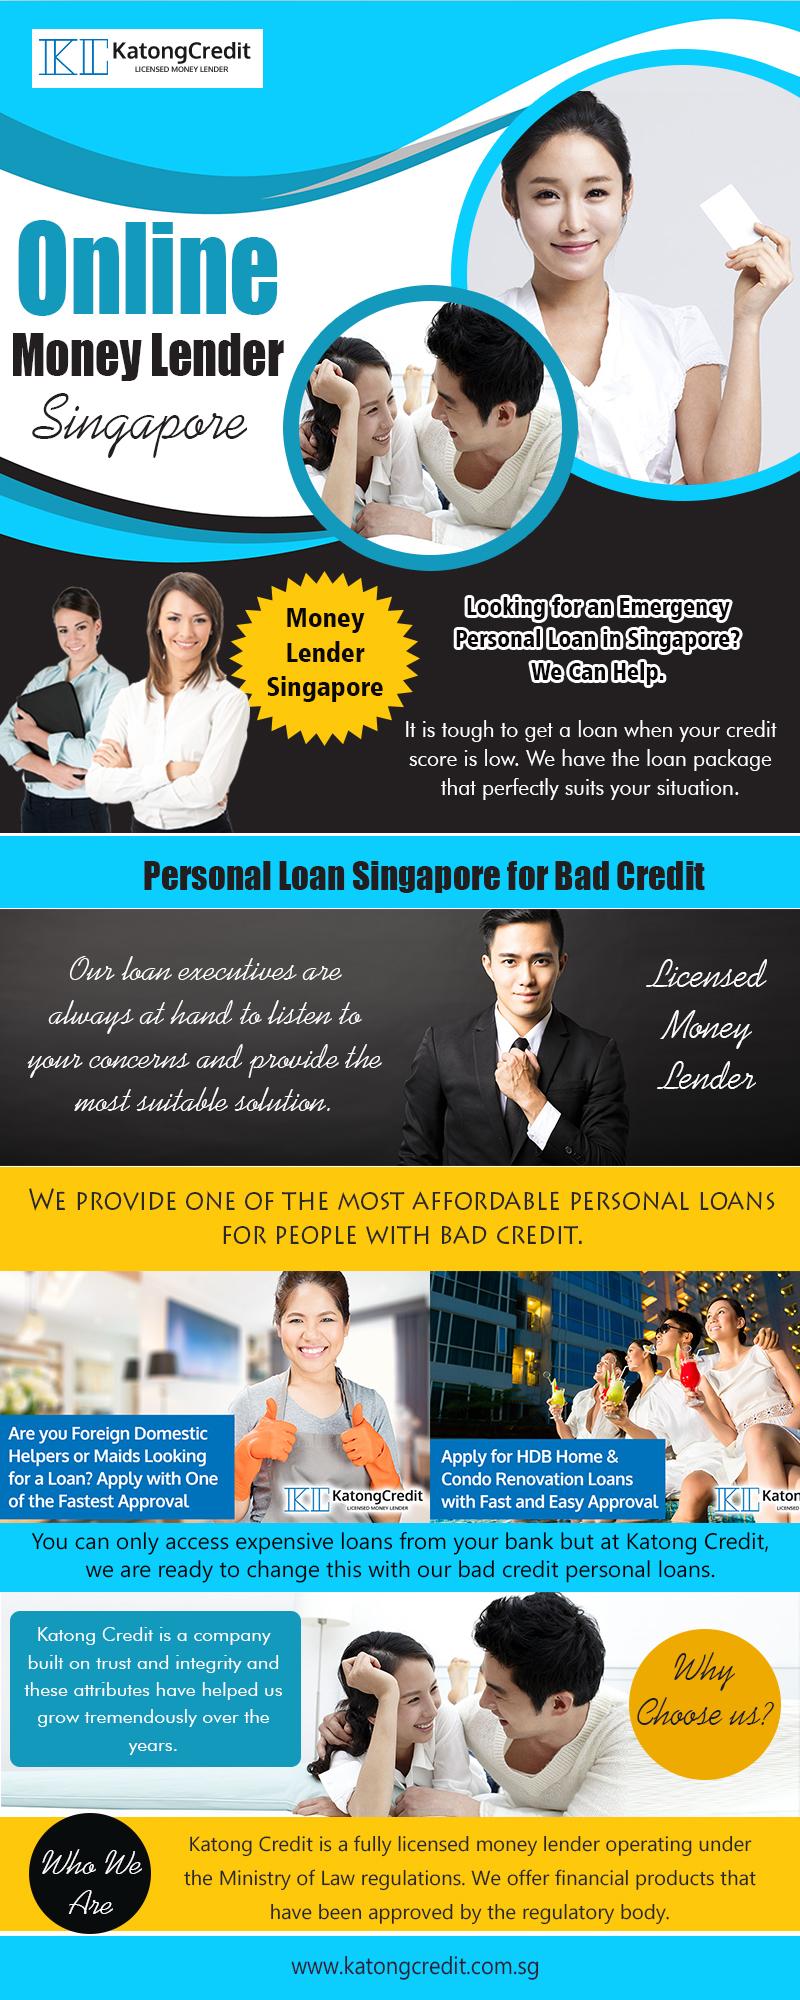 Online Money Lender Singapore 2 | 6562912210 | katongcredit.com.sg